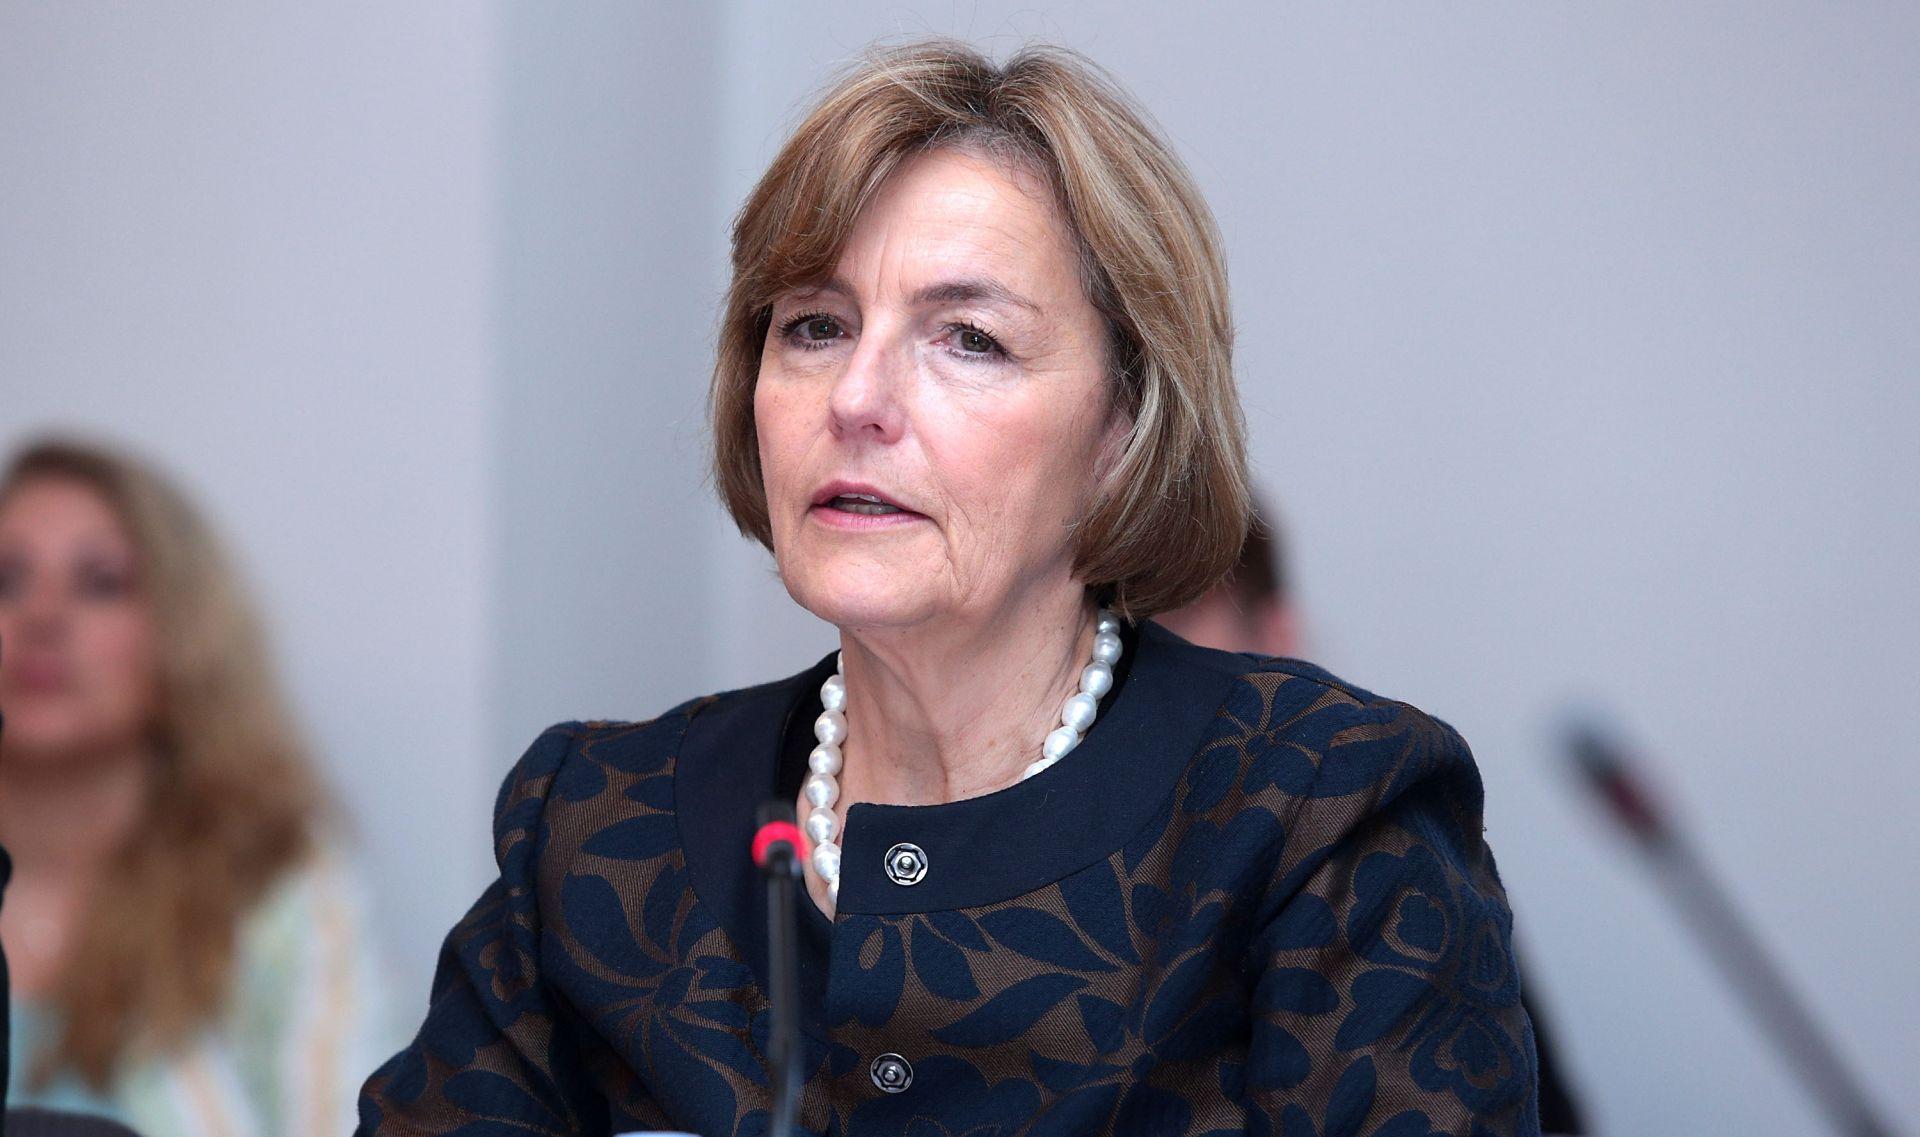 VIDEO: PUSIĆ DOBILA VELIKI PLJESAK Održano sučeljavanje kandidata za glavnog tajnika UN-a